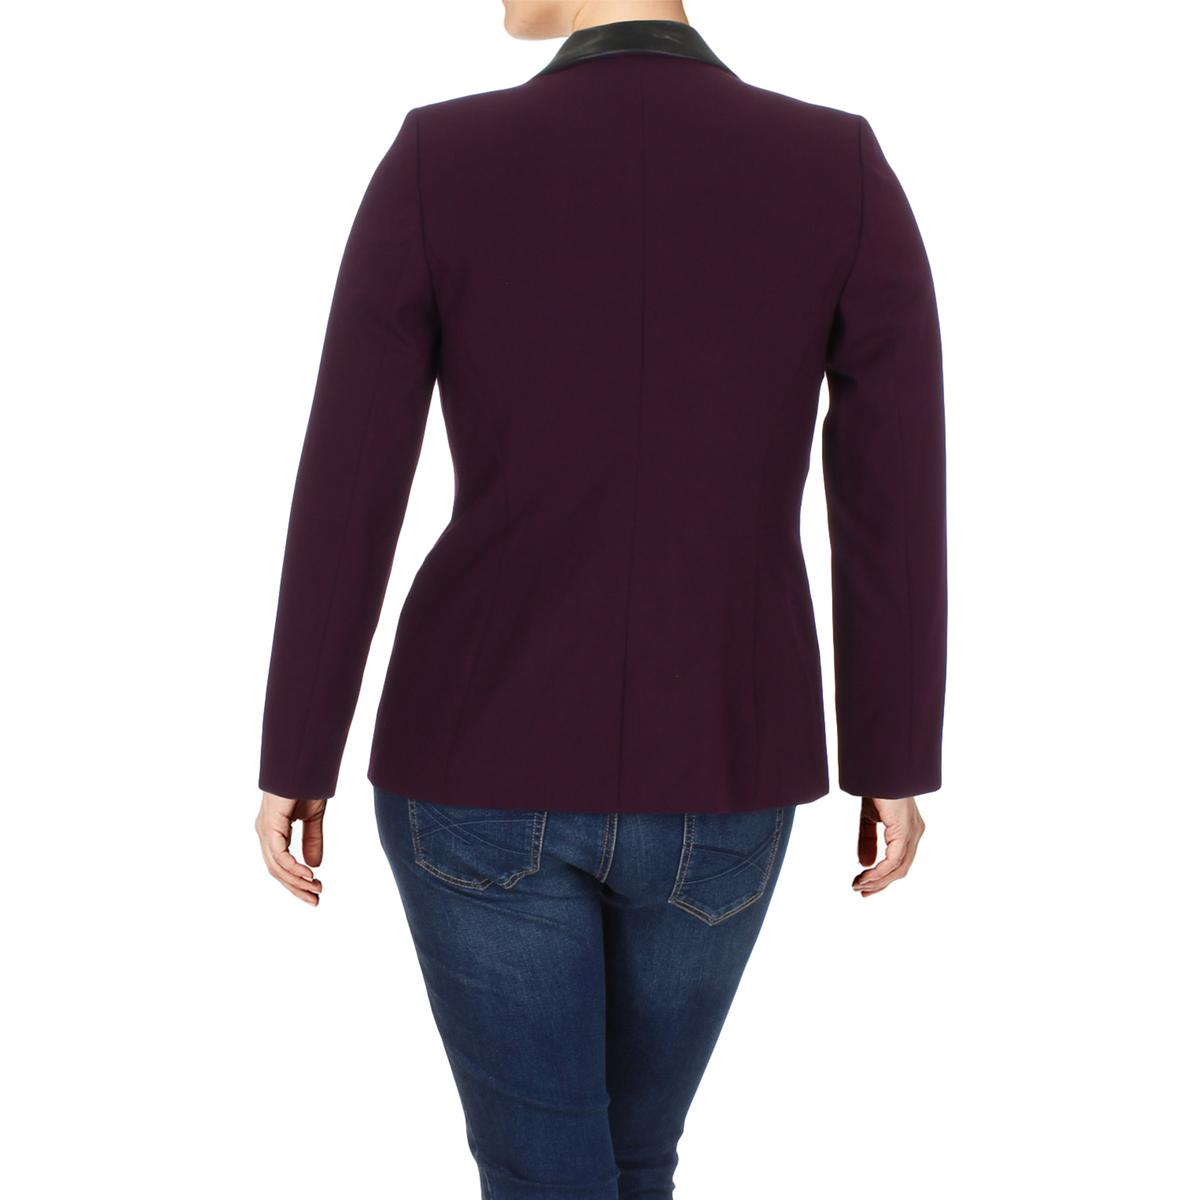 d932ea890dbfc Women s Clothing Calvin Klein Womens Faux Leather Trim One-Button Blazer  Jacket Petites BHFO 4979